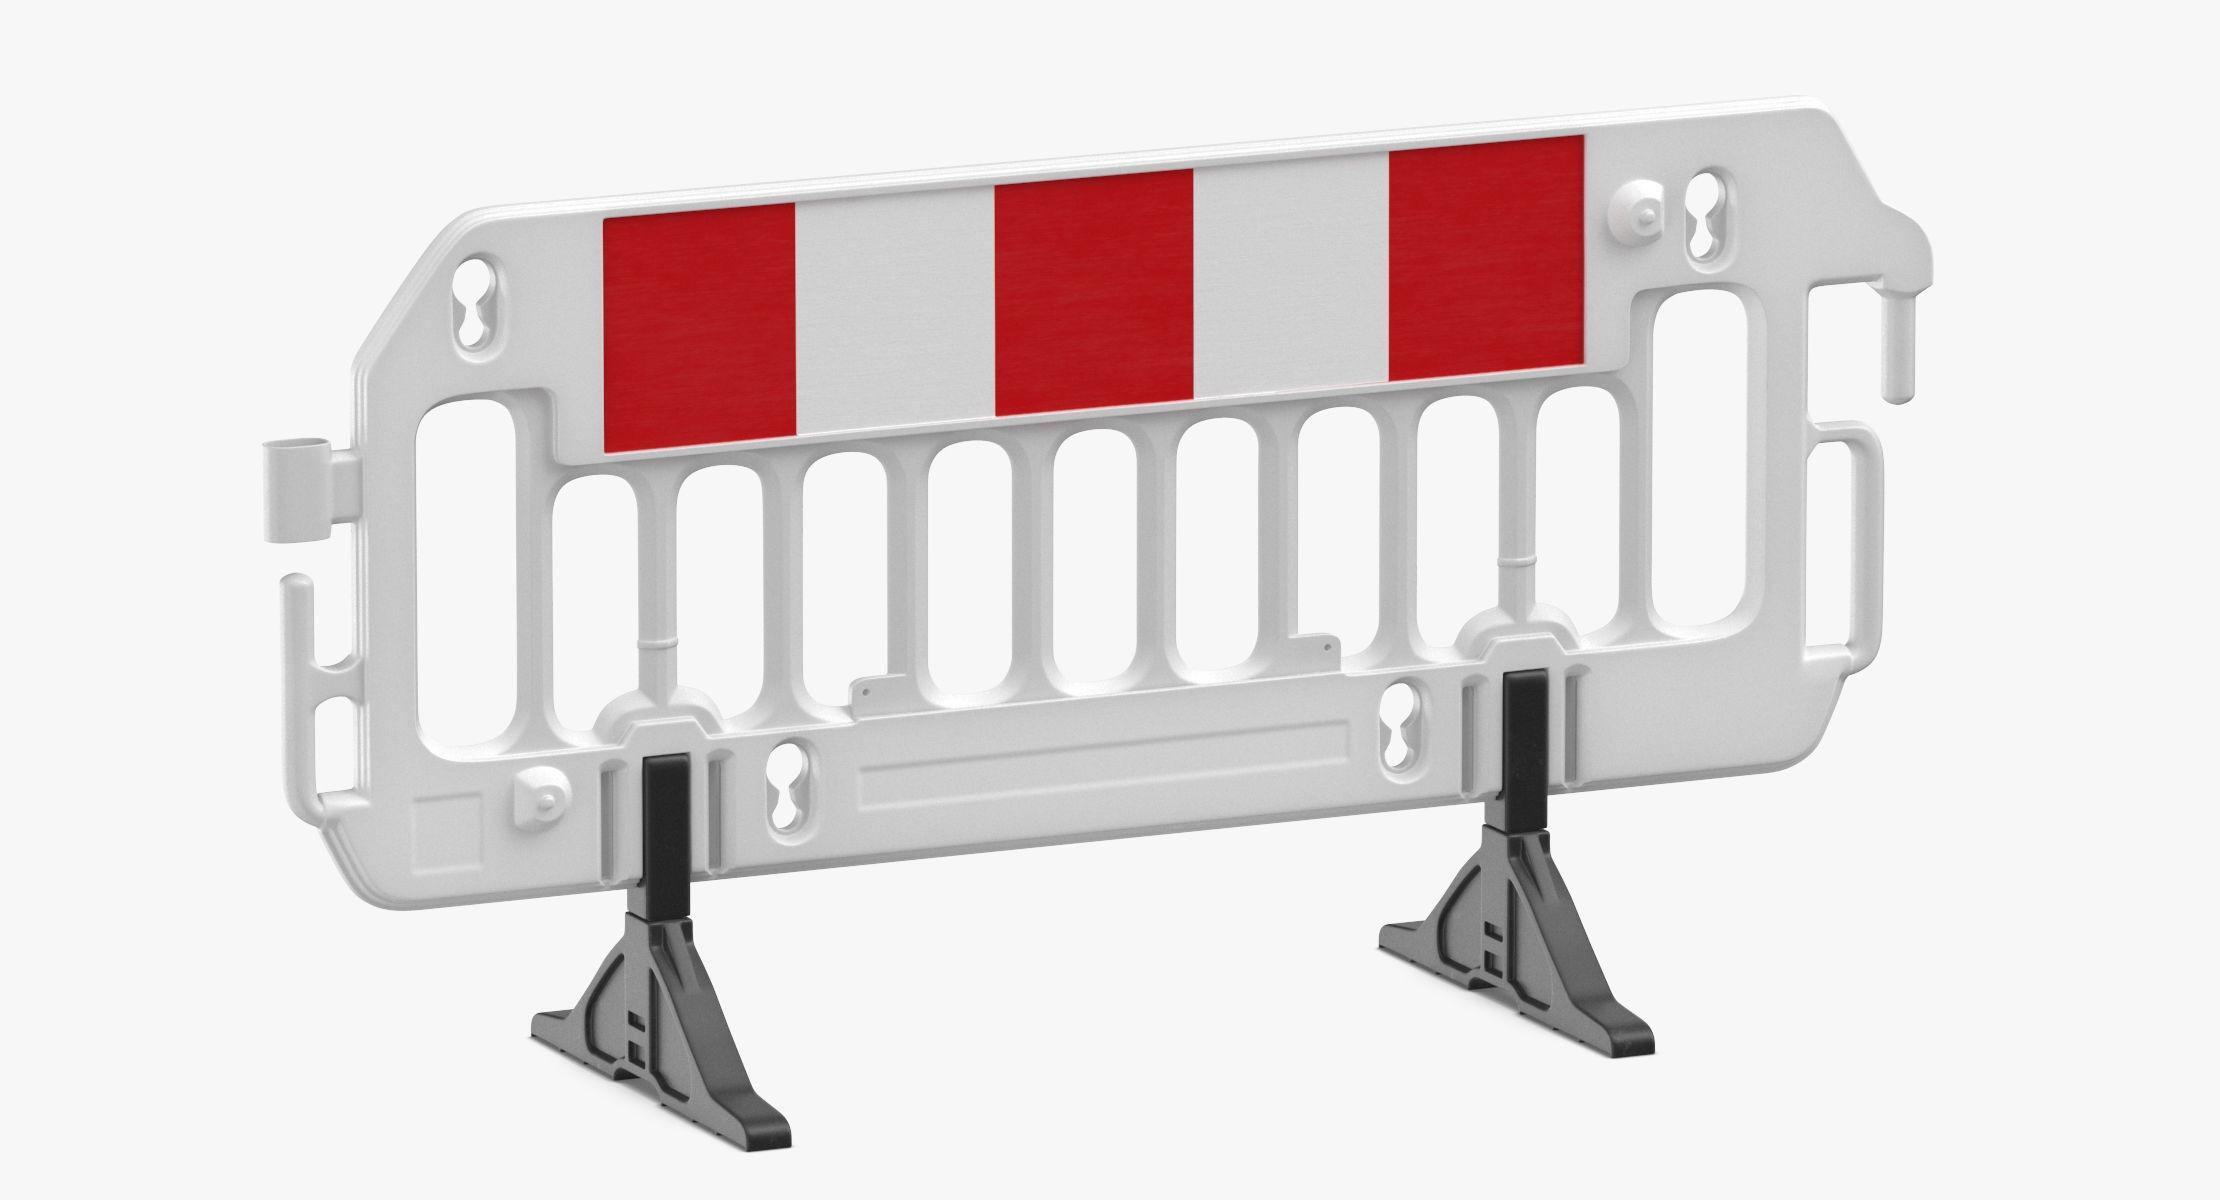 Construction Barrier 01 White - reel 1